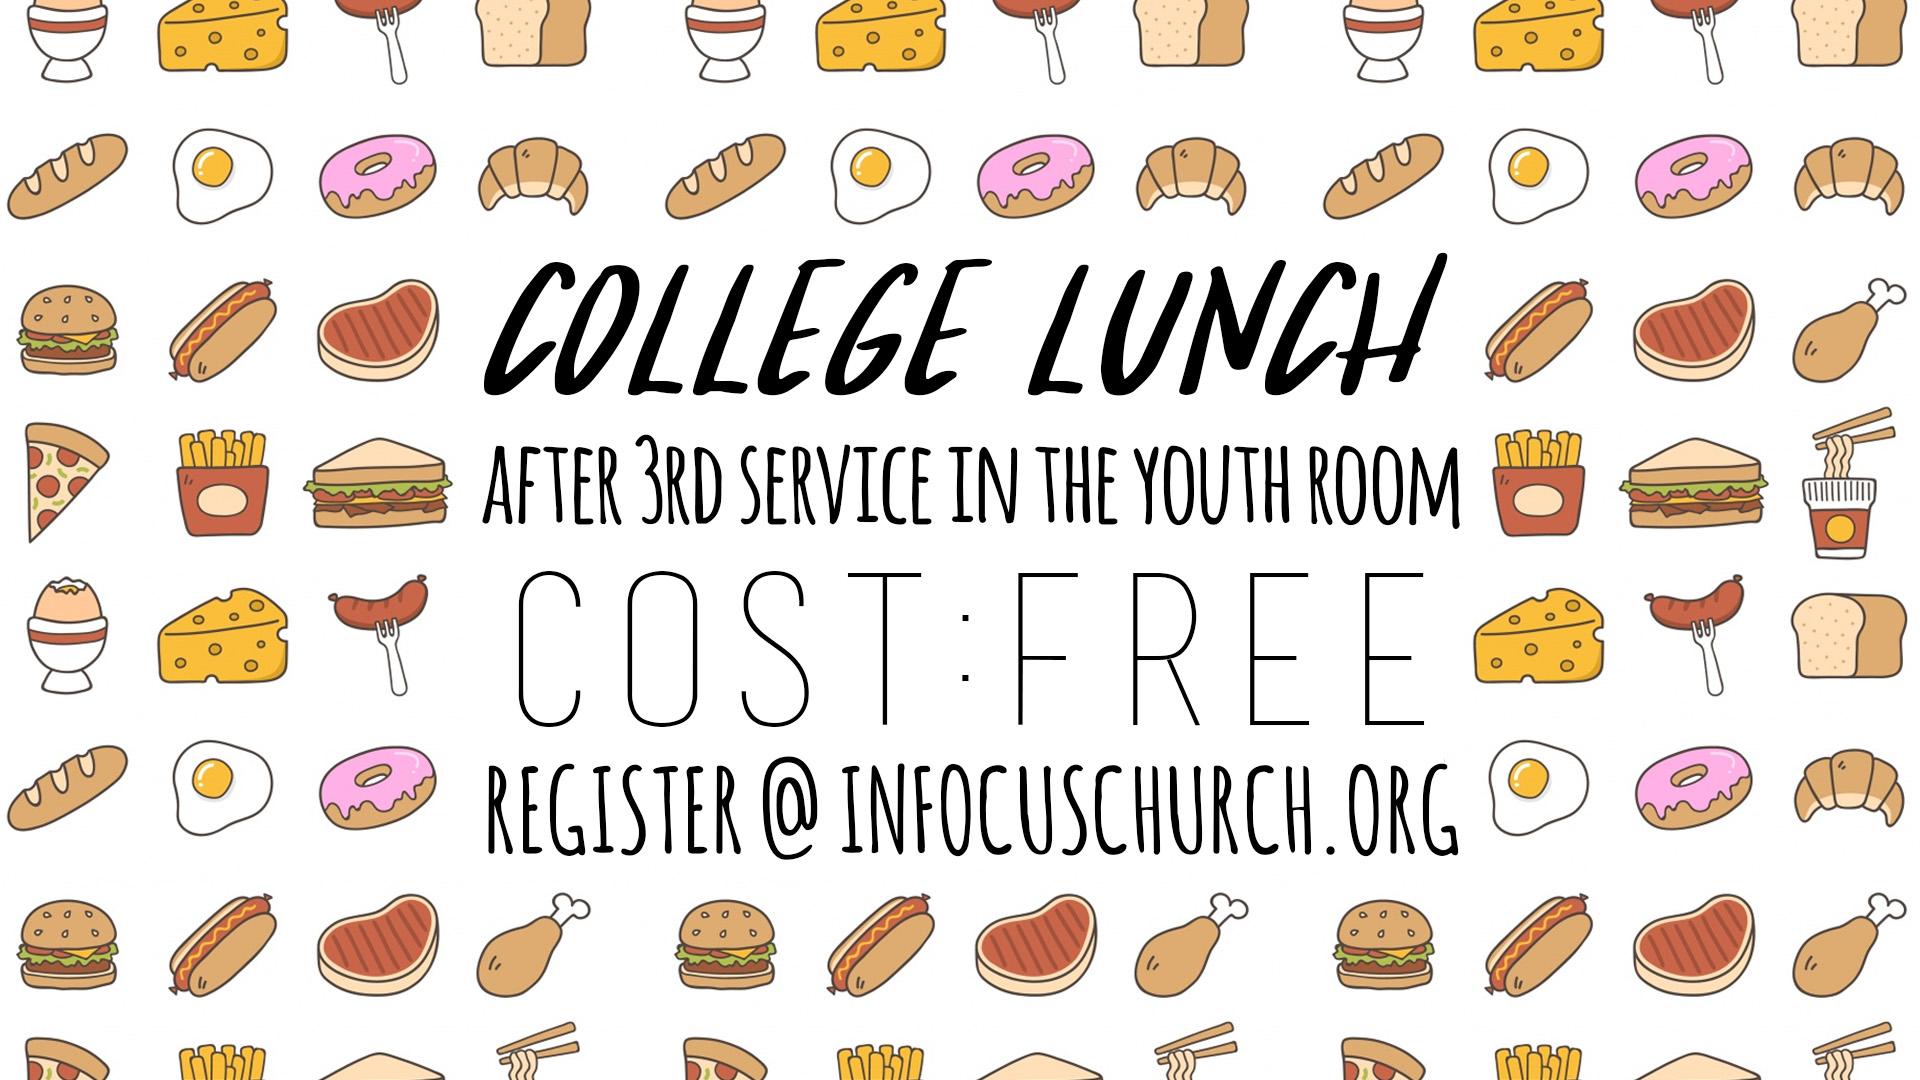 College lunch design